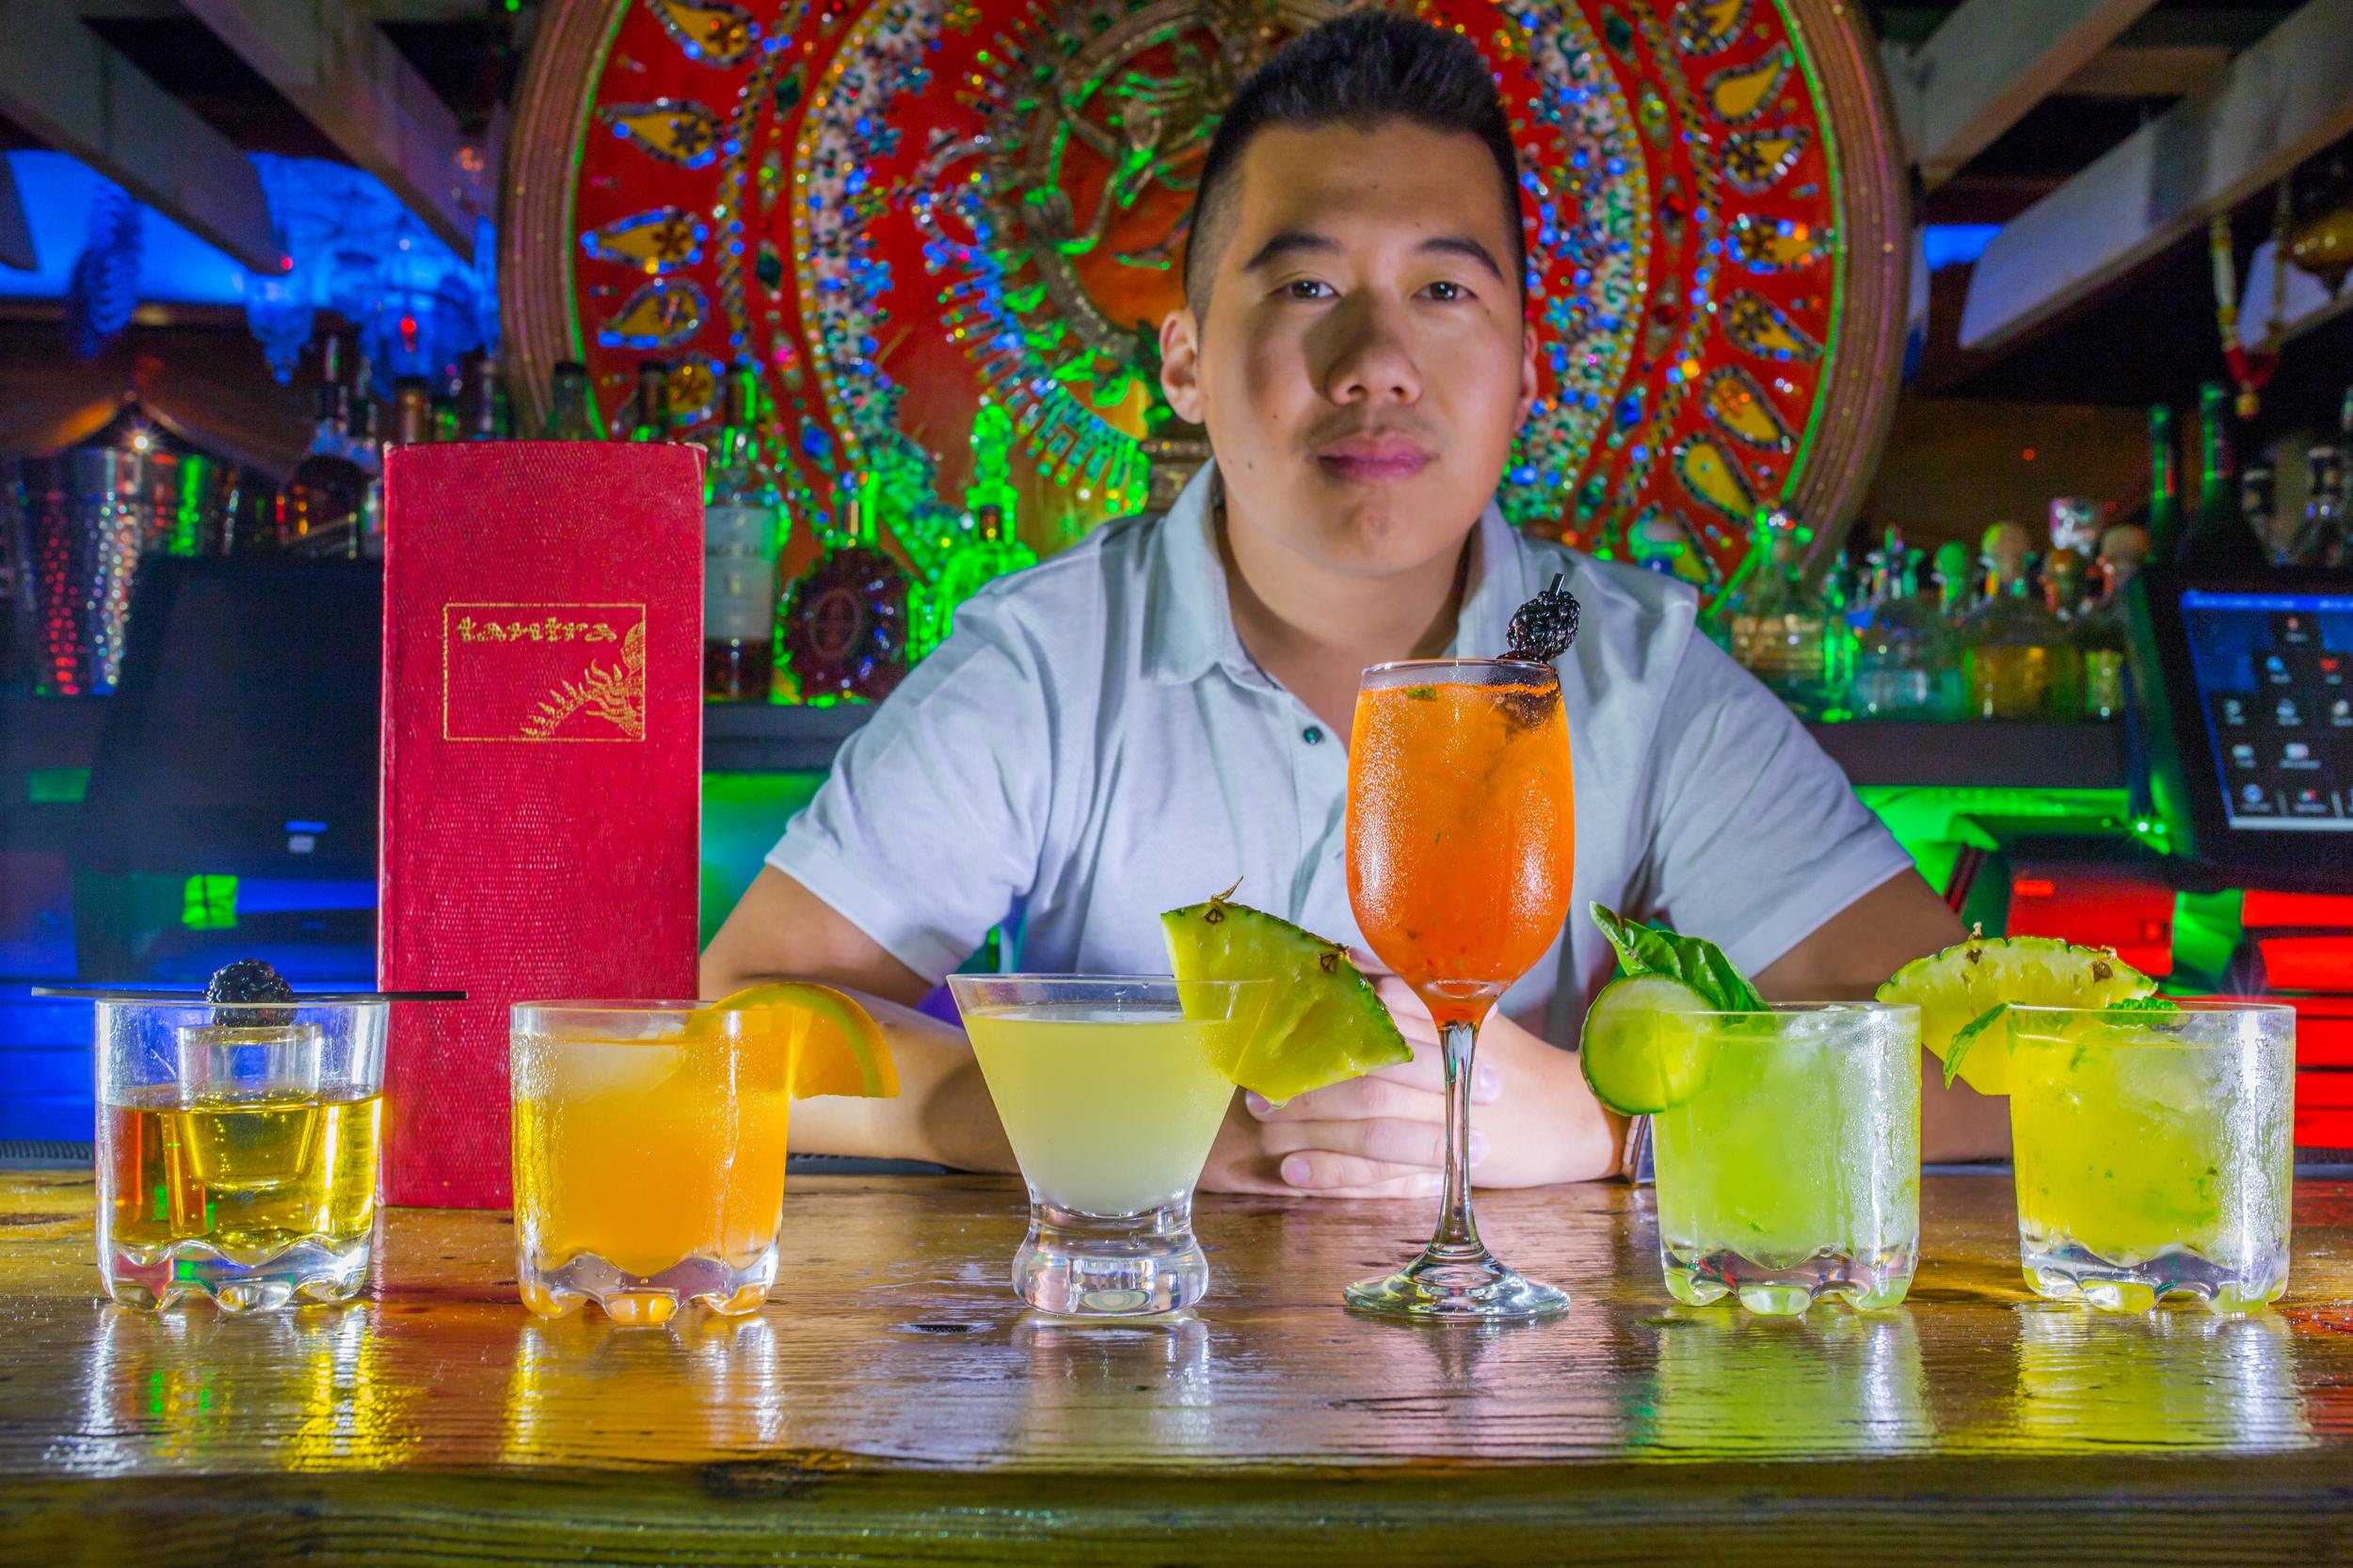 tantra_xu_bartender.jpg